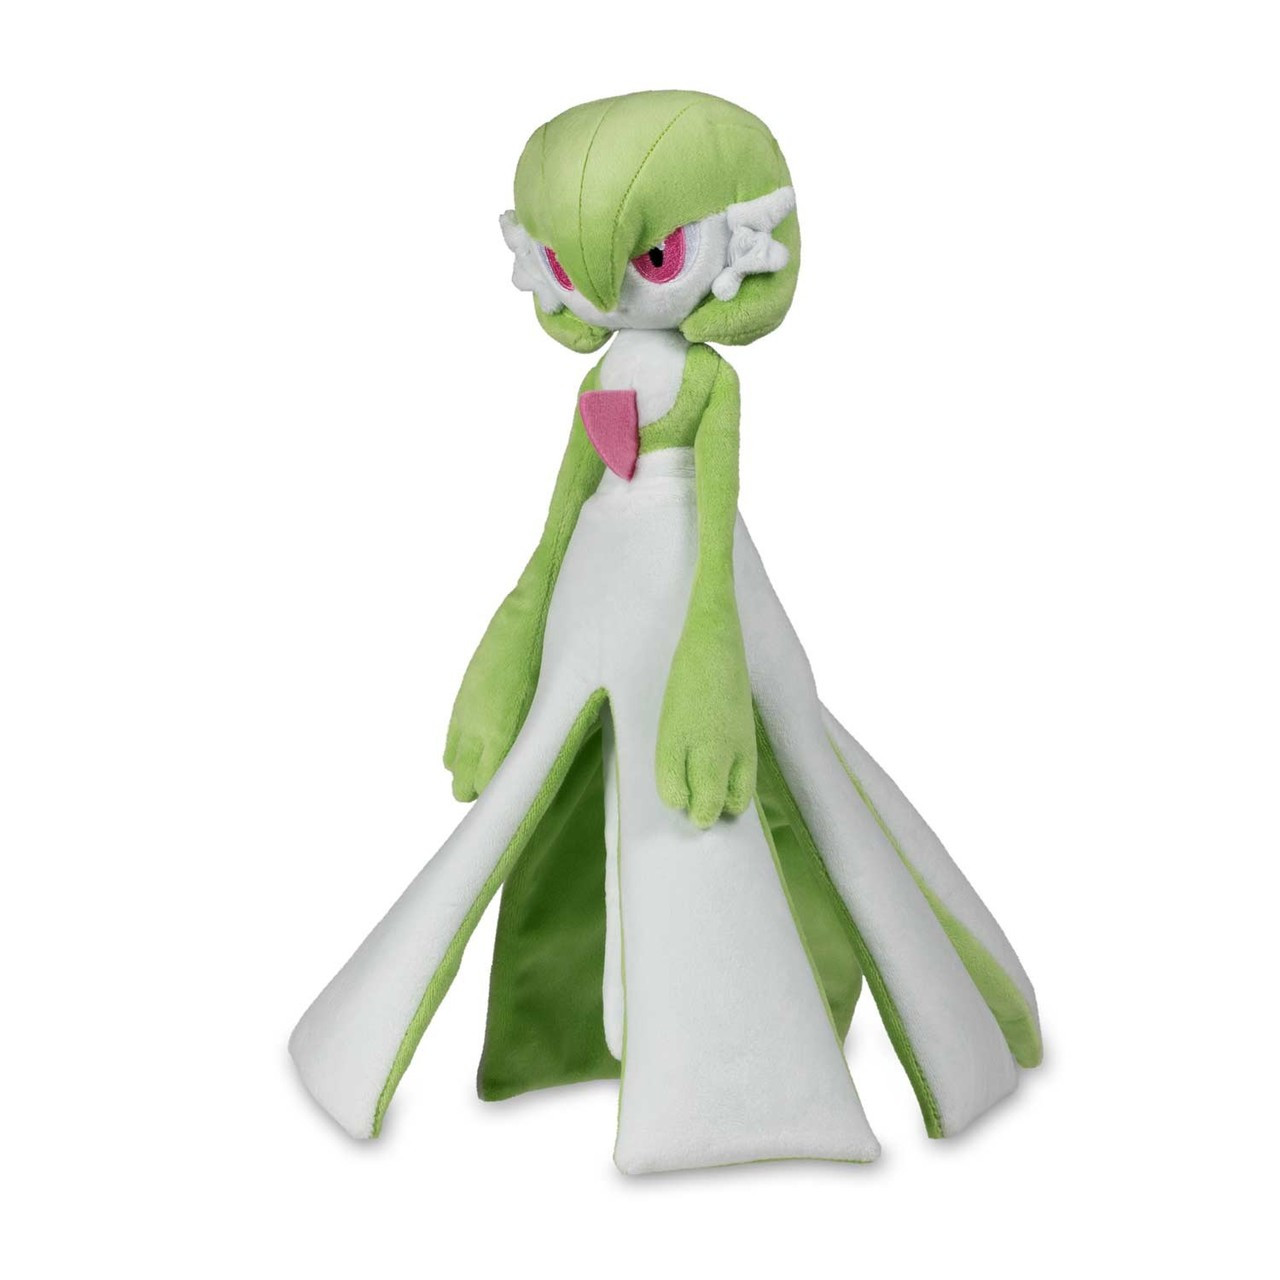 "Gardevoir 13/"" Plush Doll Figure Toy"